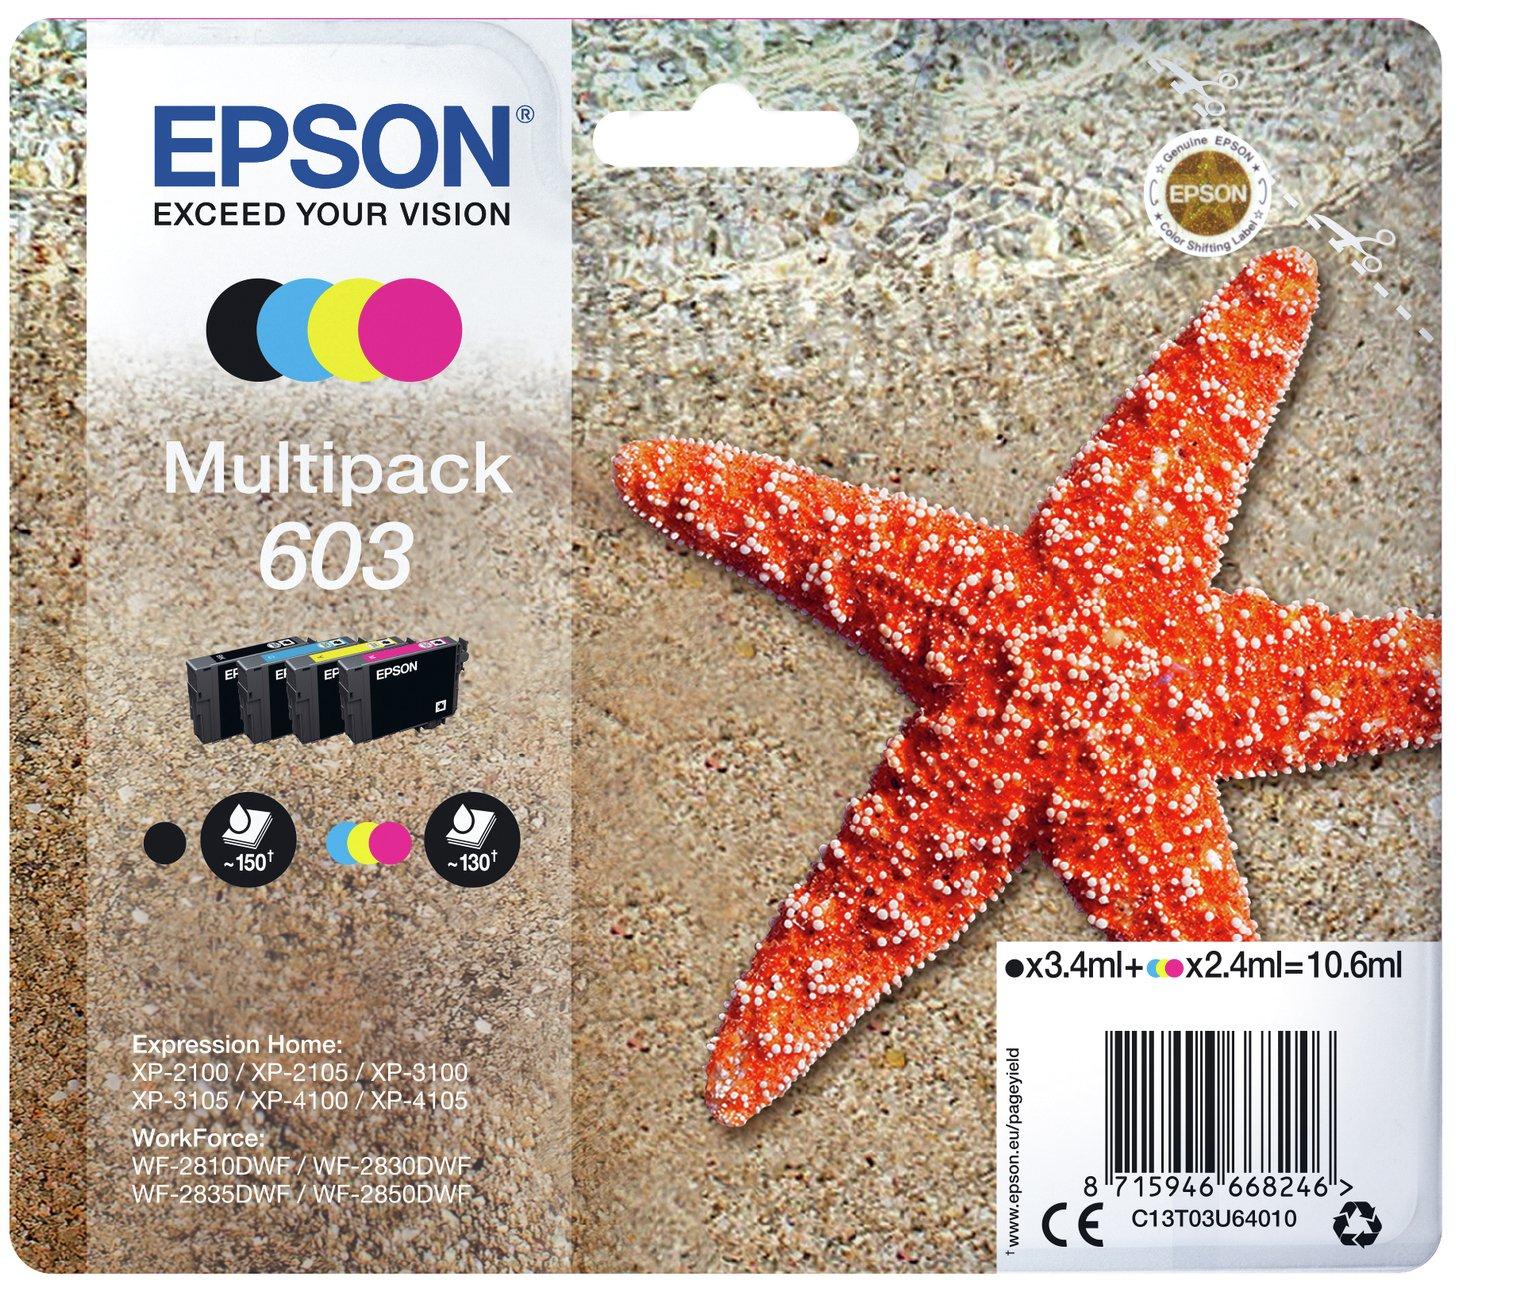 Epson 603 Starfish Ink Cartridge - Black & Colour